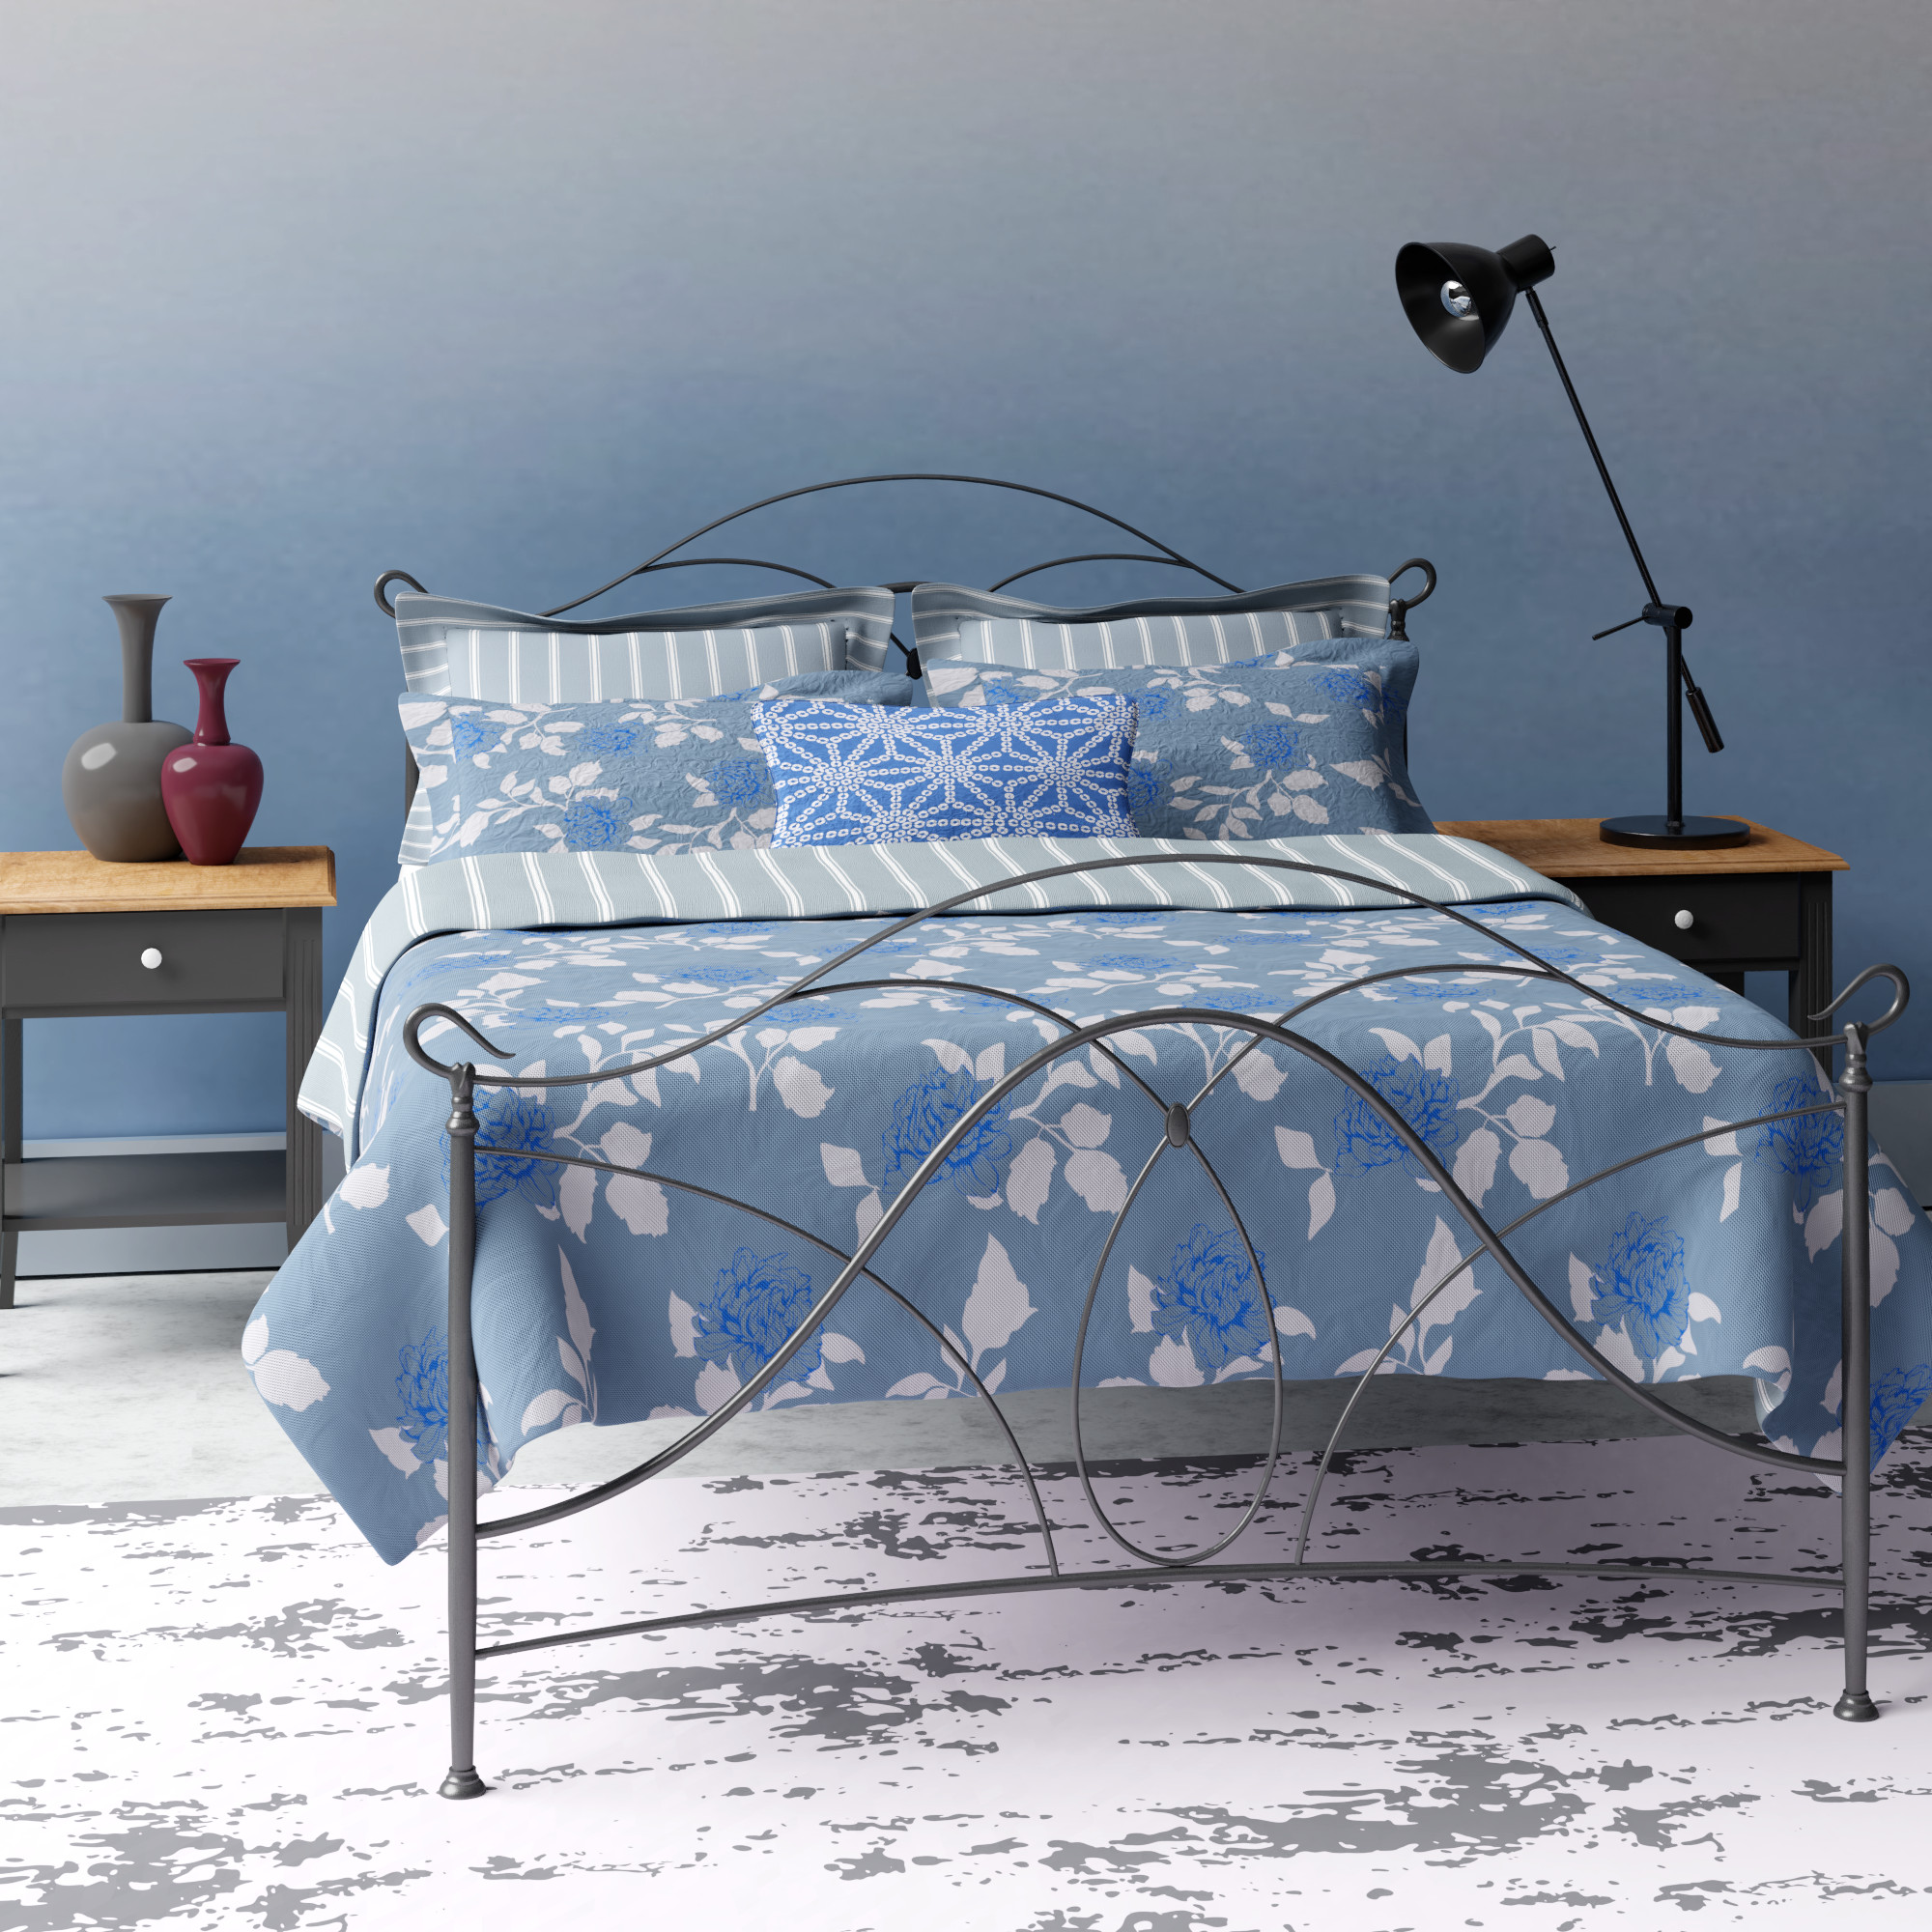 Ardo metal bed in grey